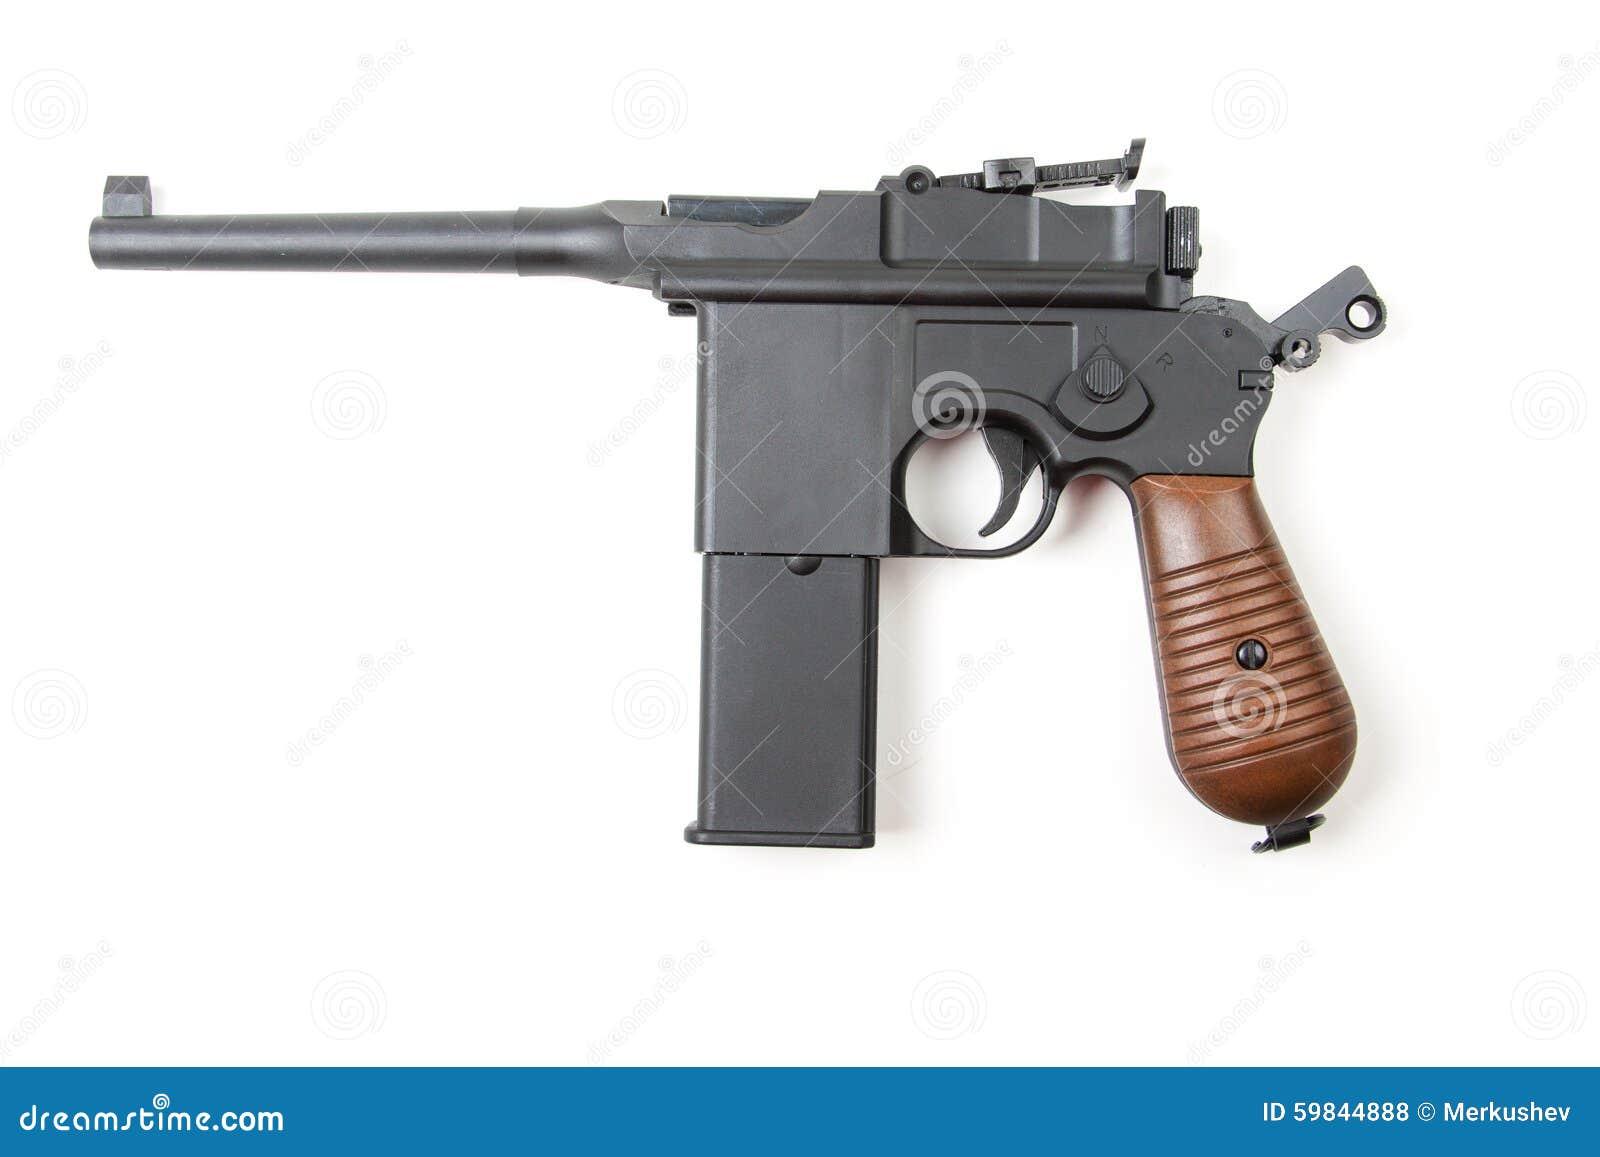 gun white background - photo #32